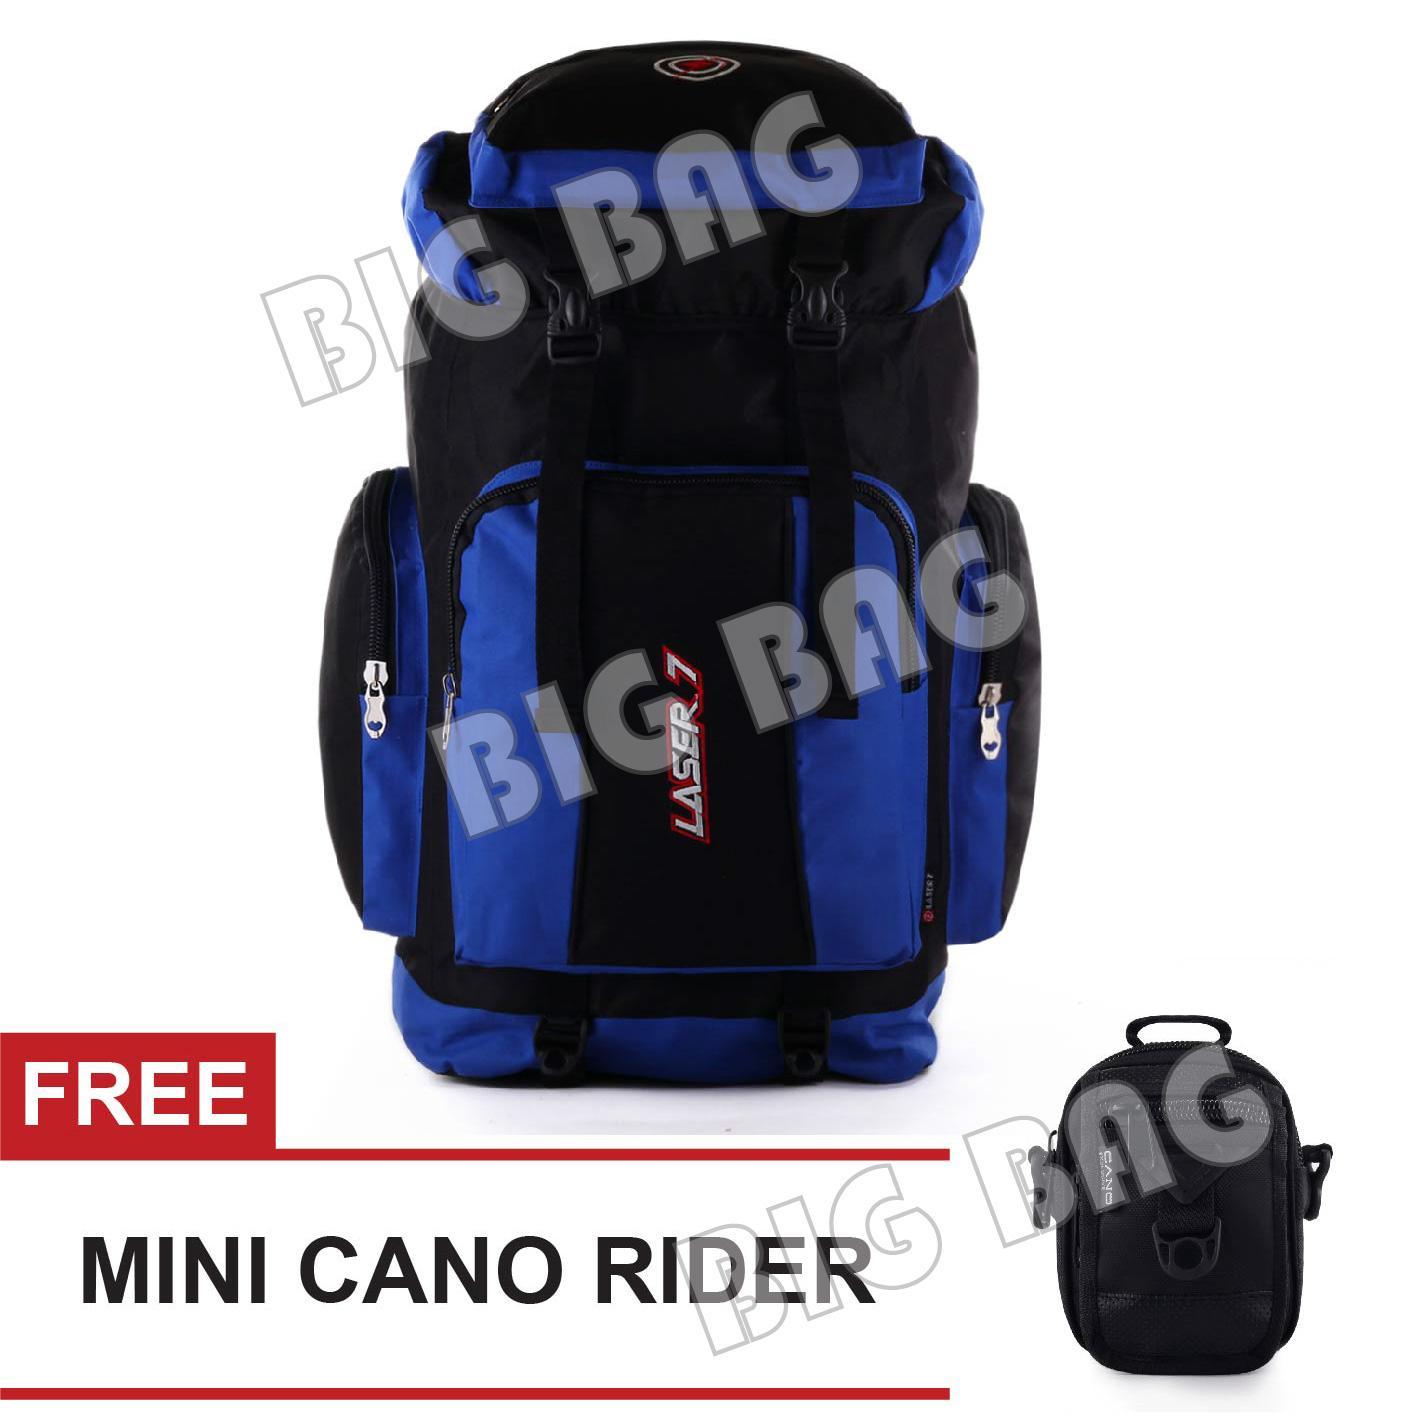 Gear Bag Cyborg X23 Backpack Black Grey Raincover Free Mini Cano Source · Tas Ransel Mudik Carrier Gunung Laser7 Colorado Outdoor Adventure Backpacking ...